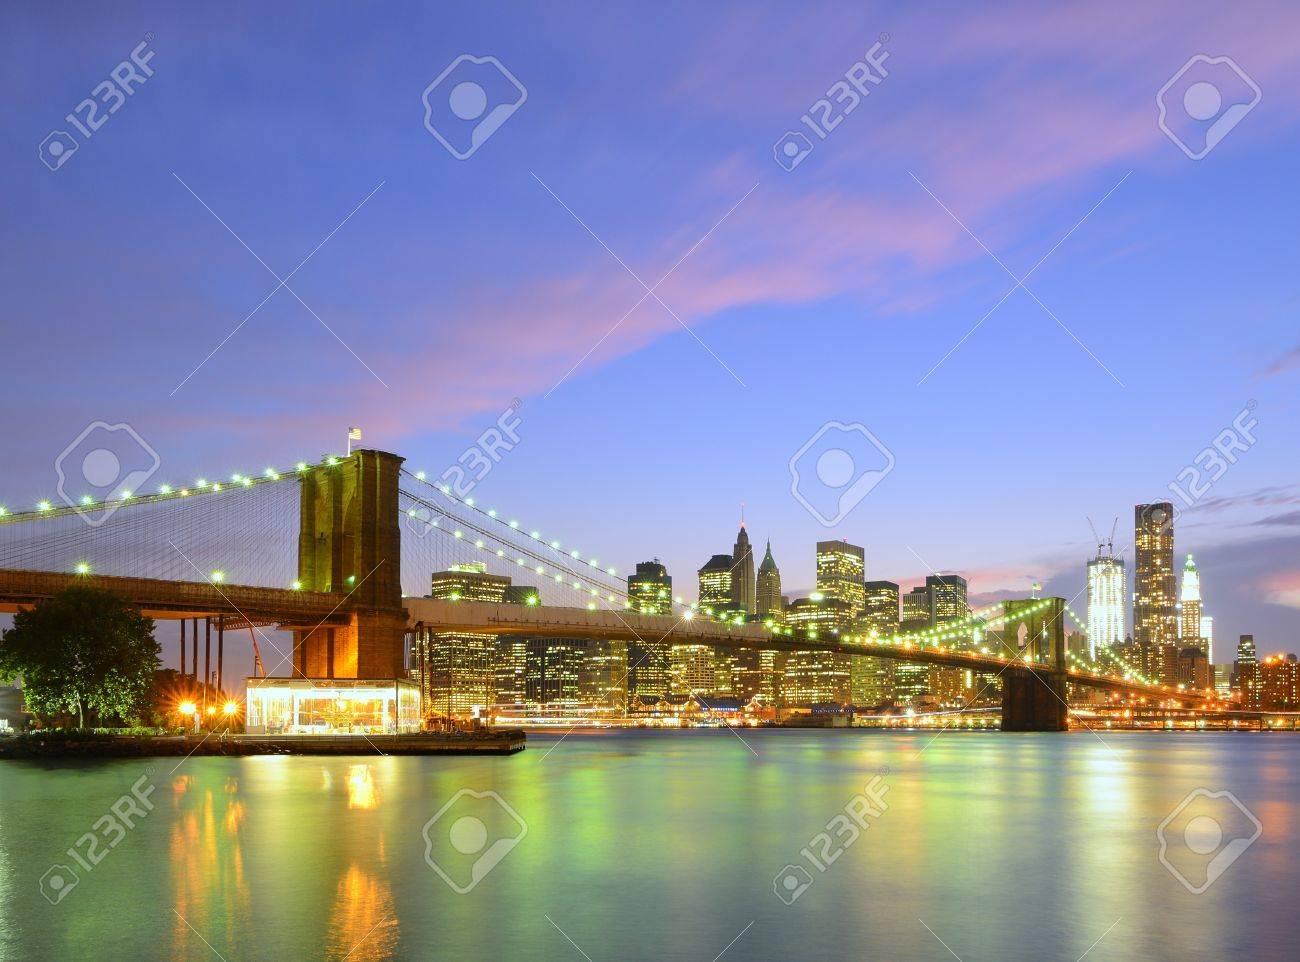 Brooklyn Bridge and Lower Manhattan skyline in New York City. Stock Photo - 10483829